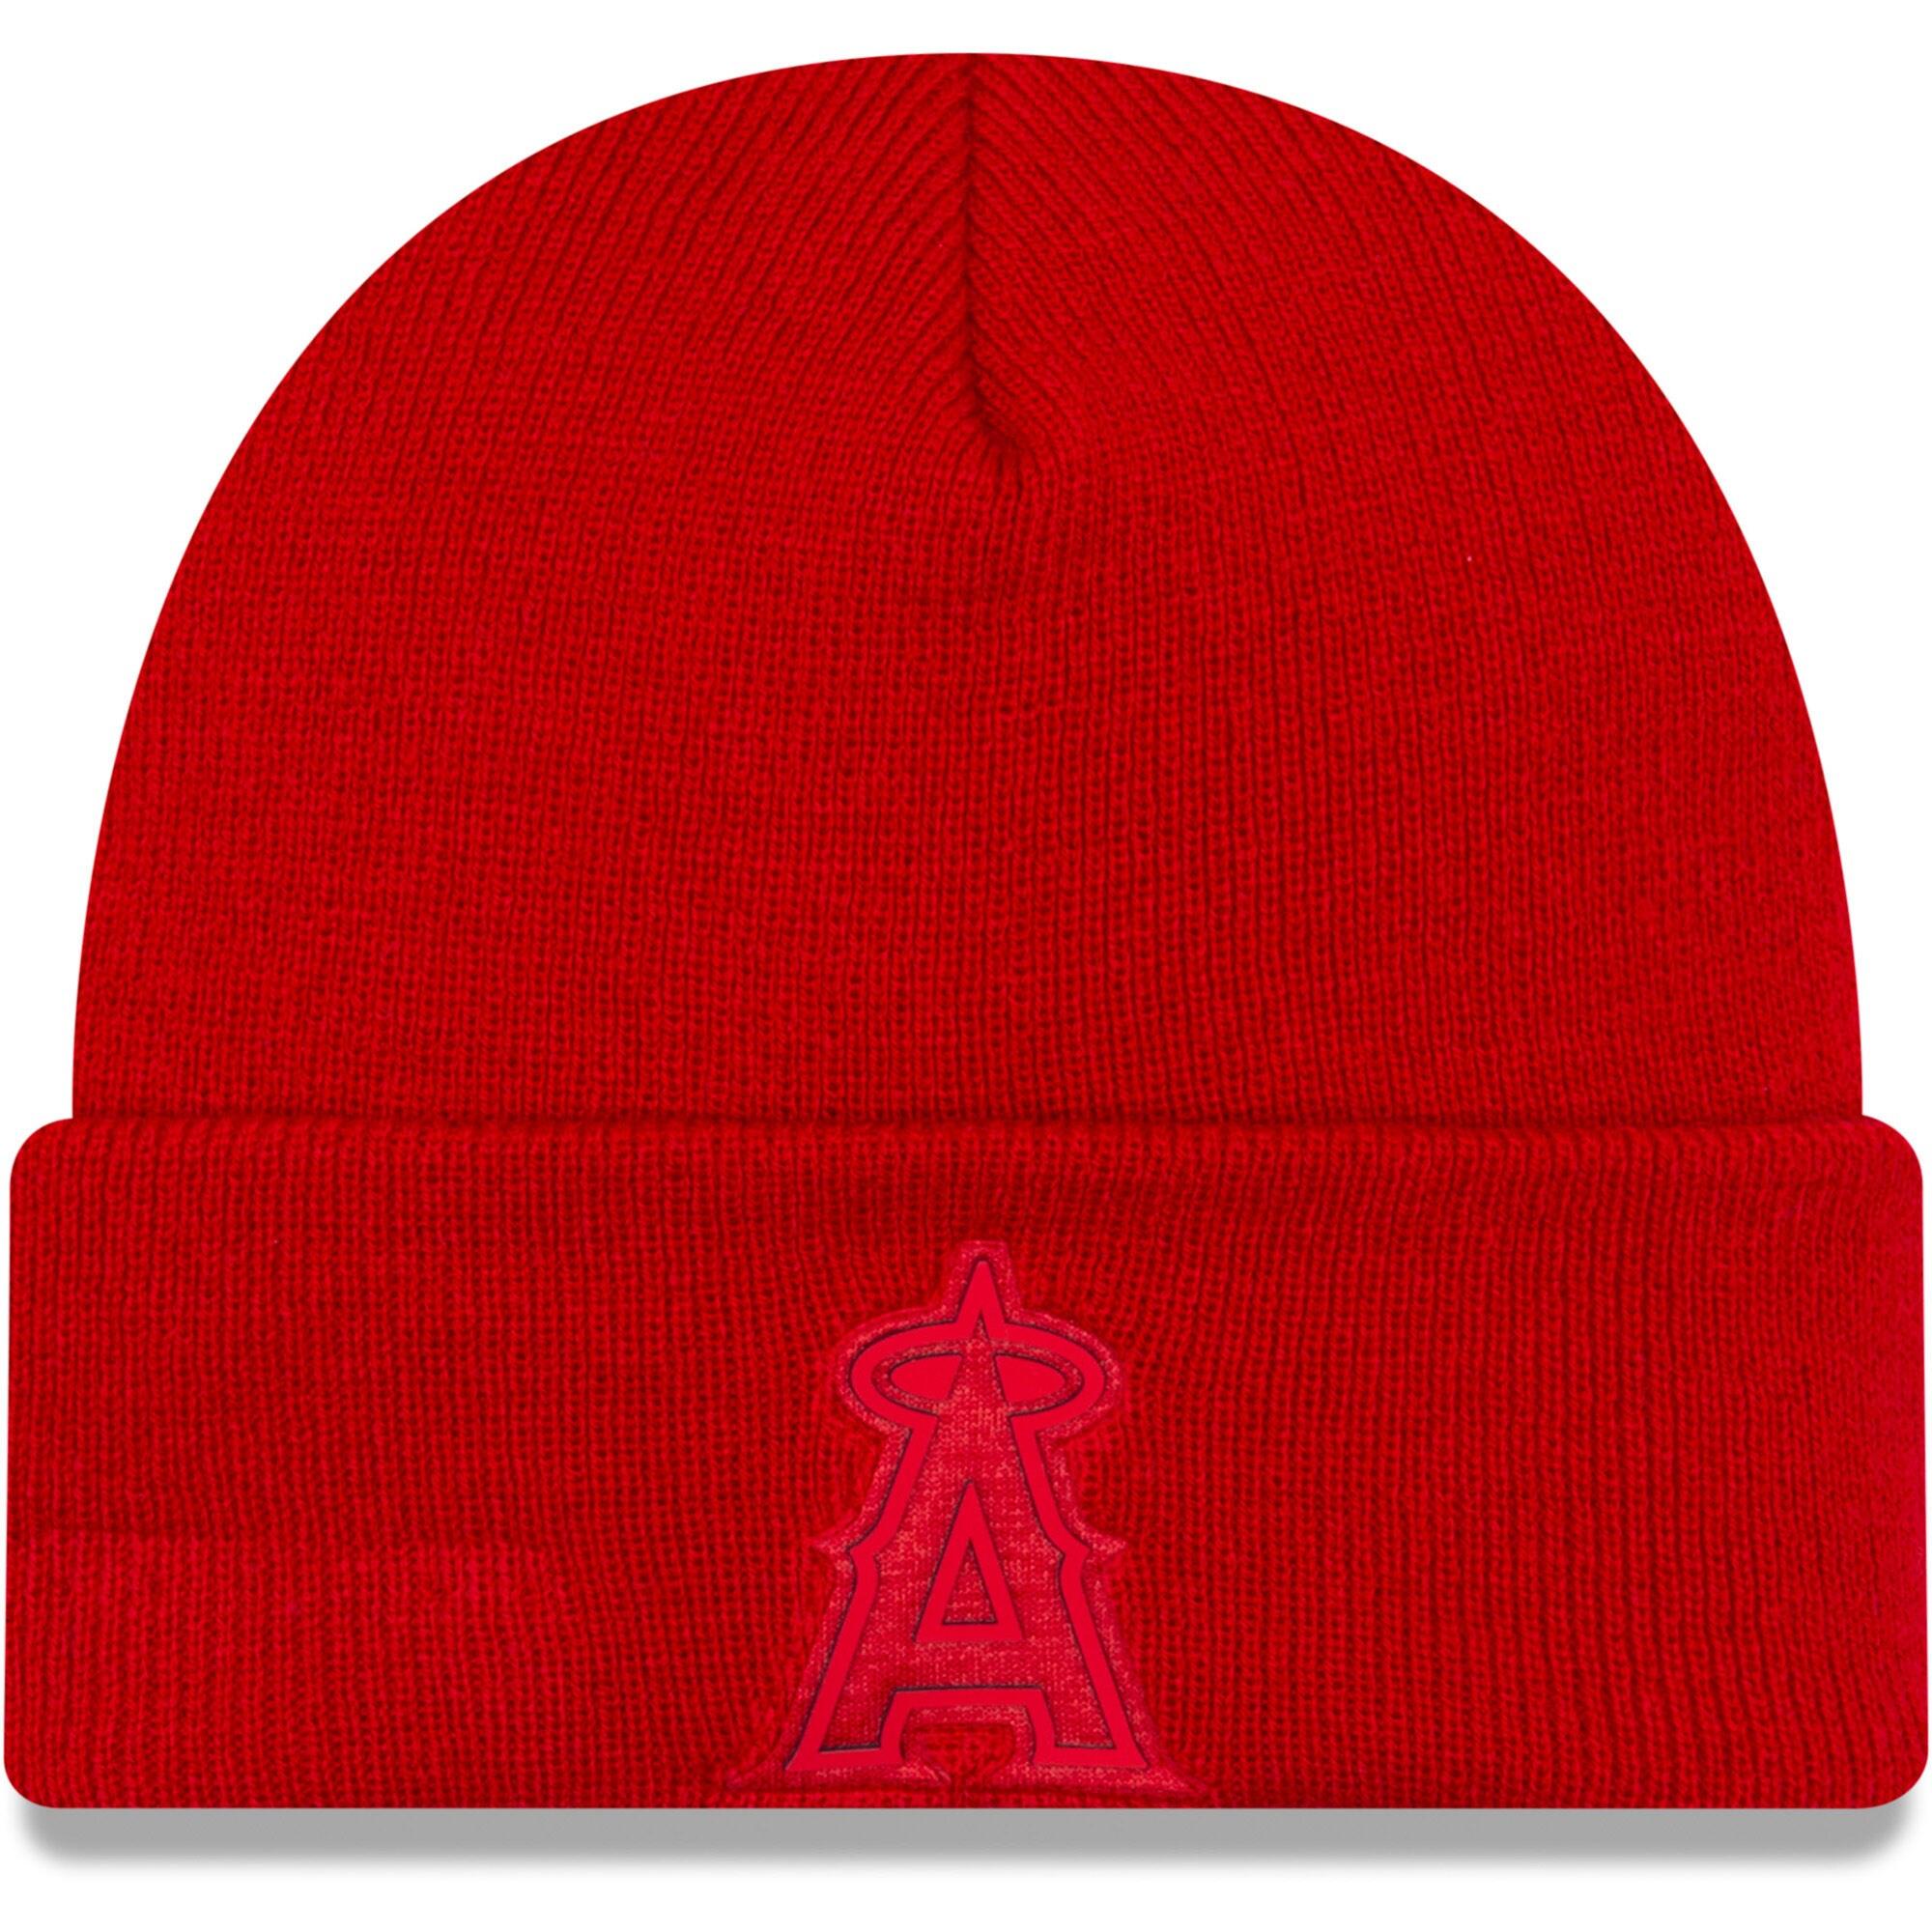 Los Angeles Angels New Era Vivid Cuffed Knit Hat - Red